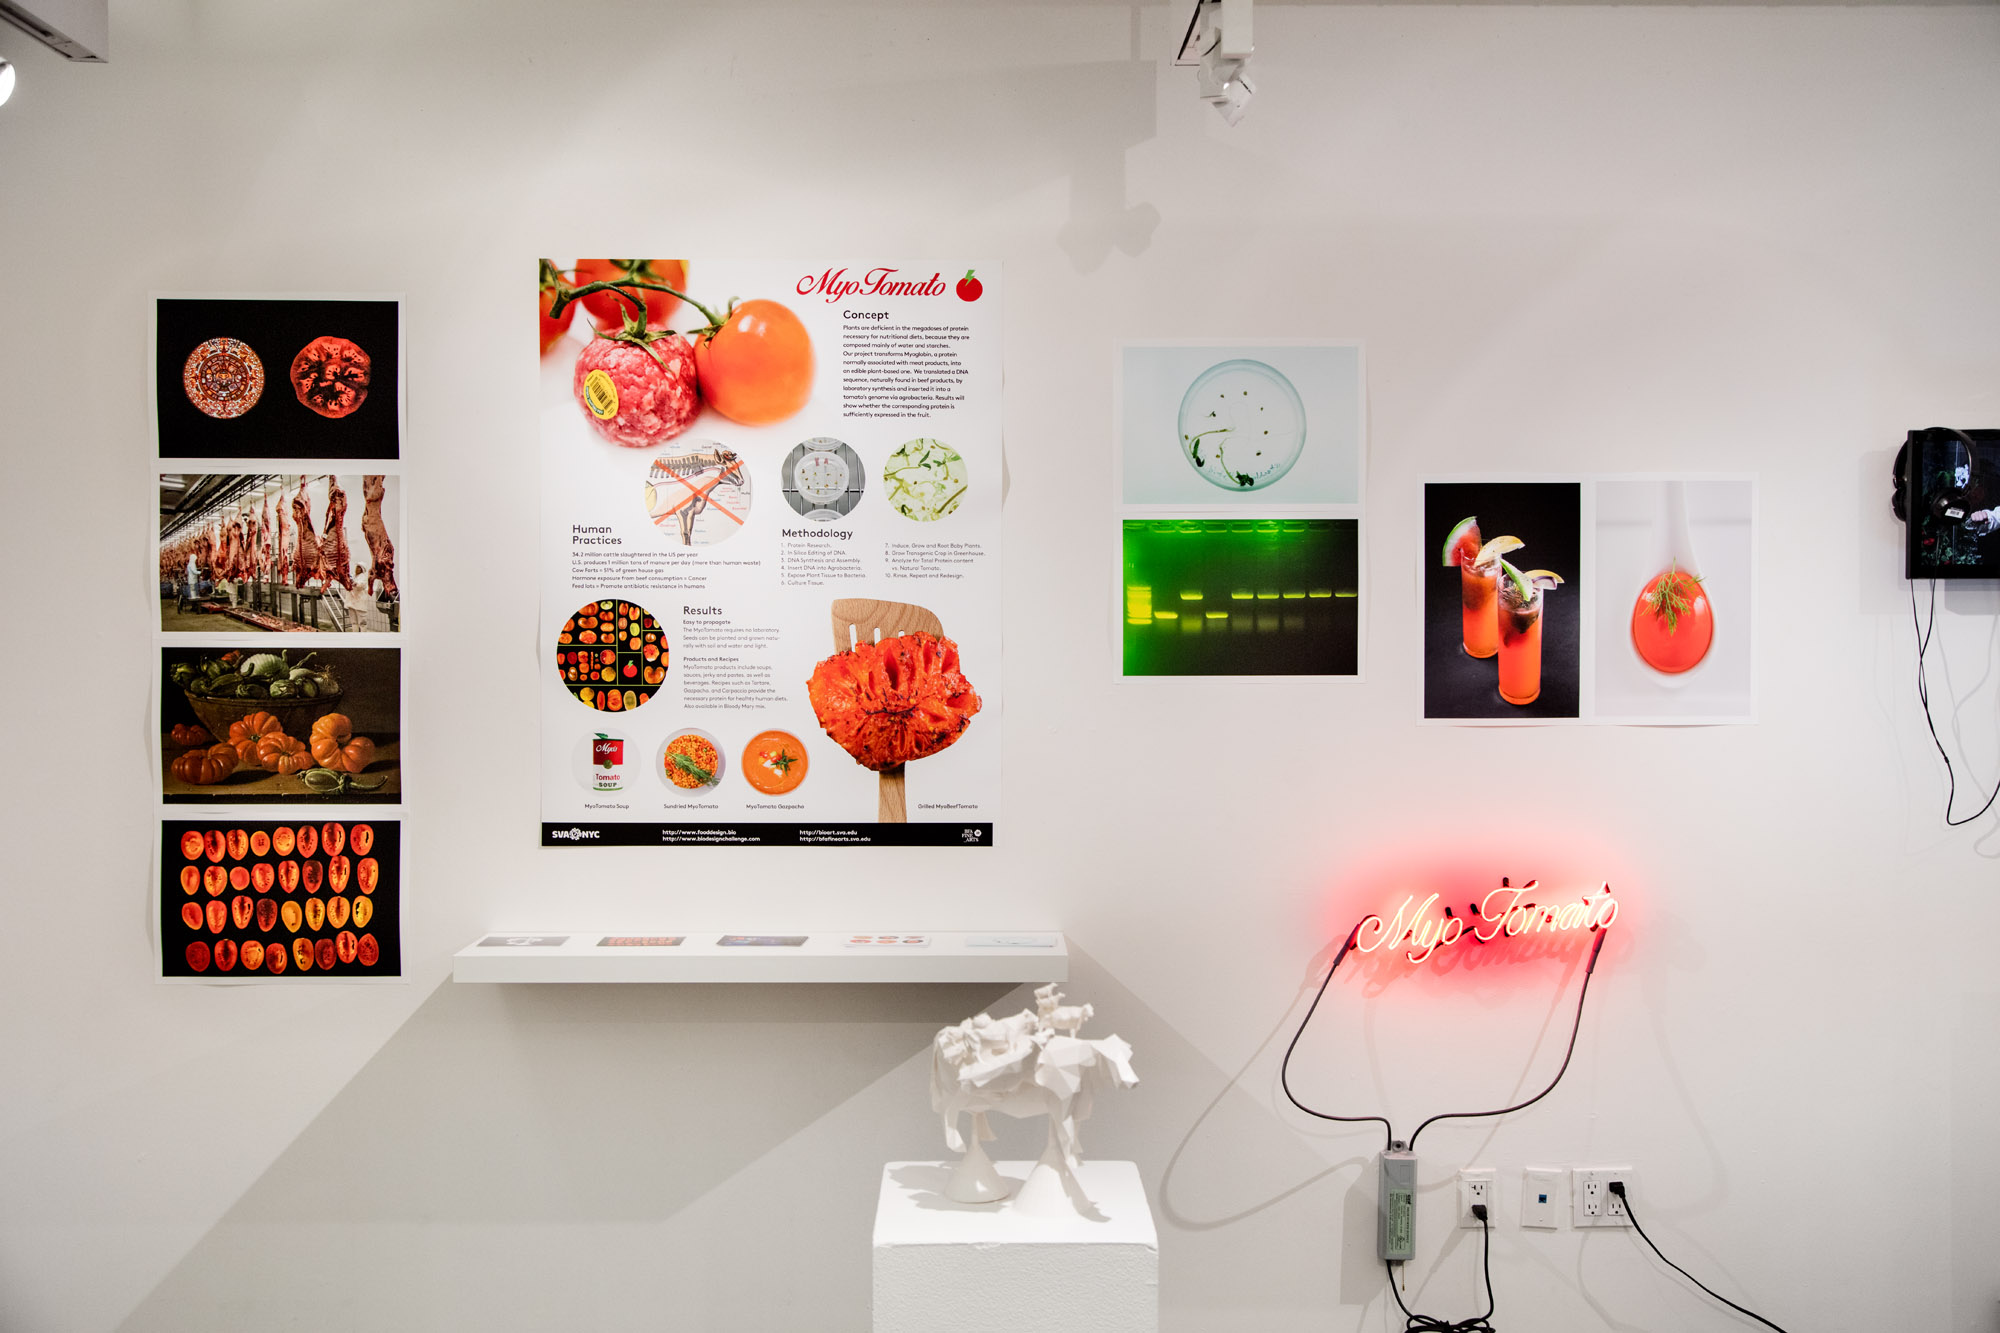 Our Biotech Future S Exhibition Bfa Fine Arts Department Sva Nyc